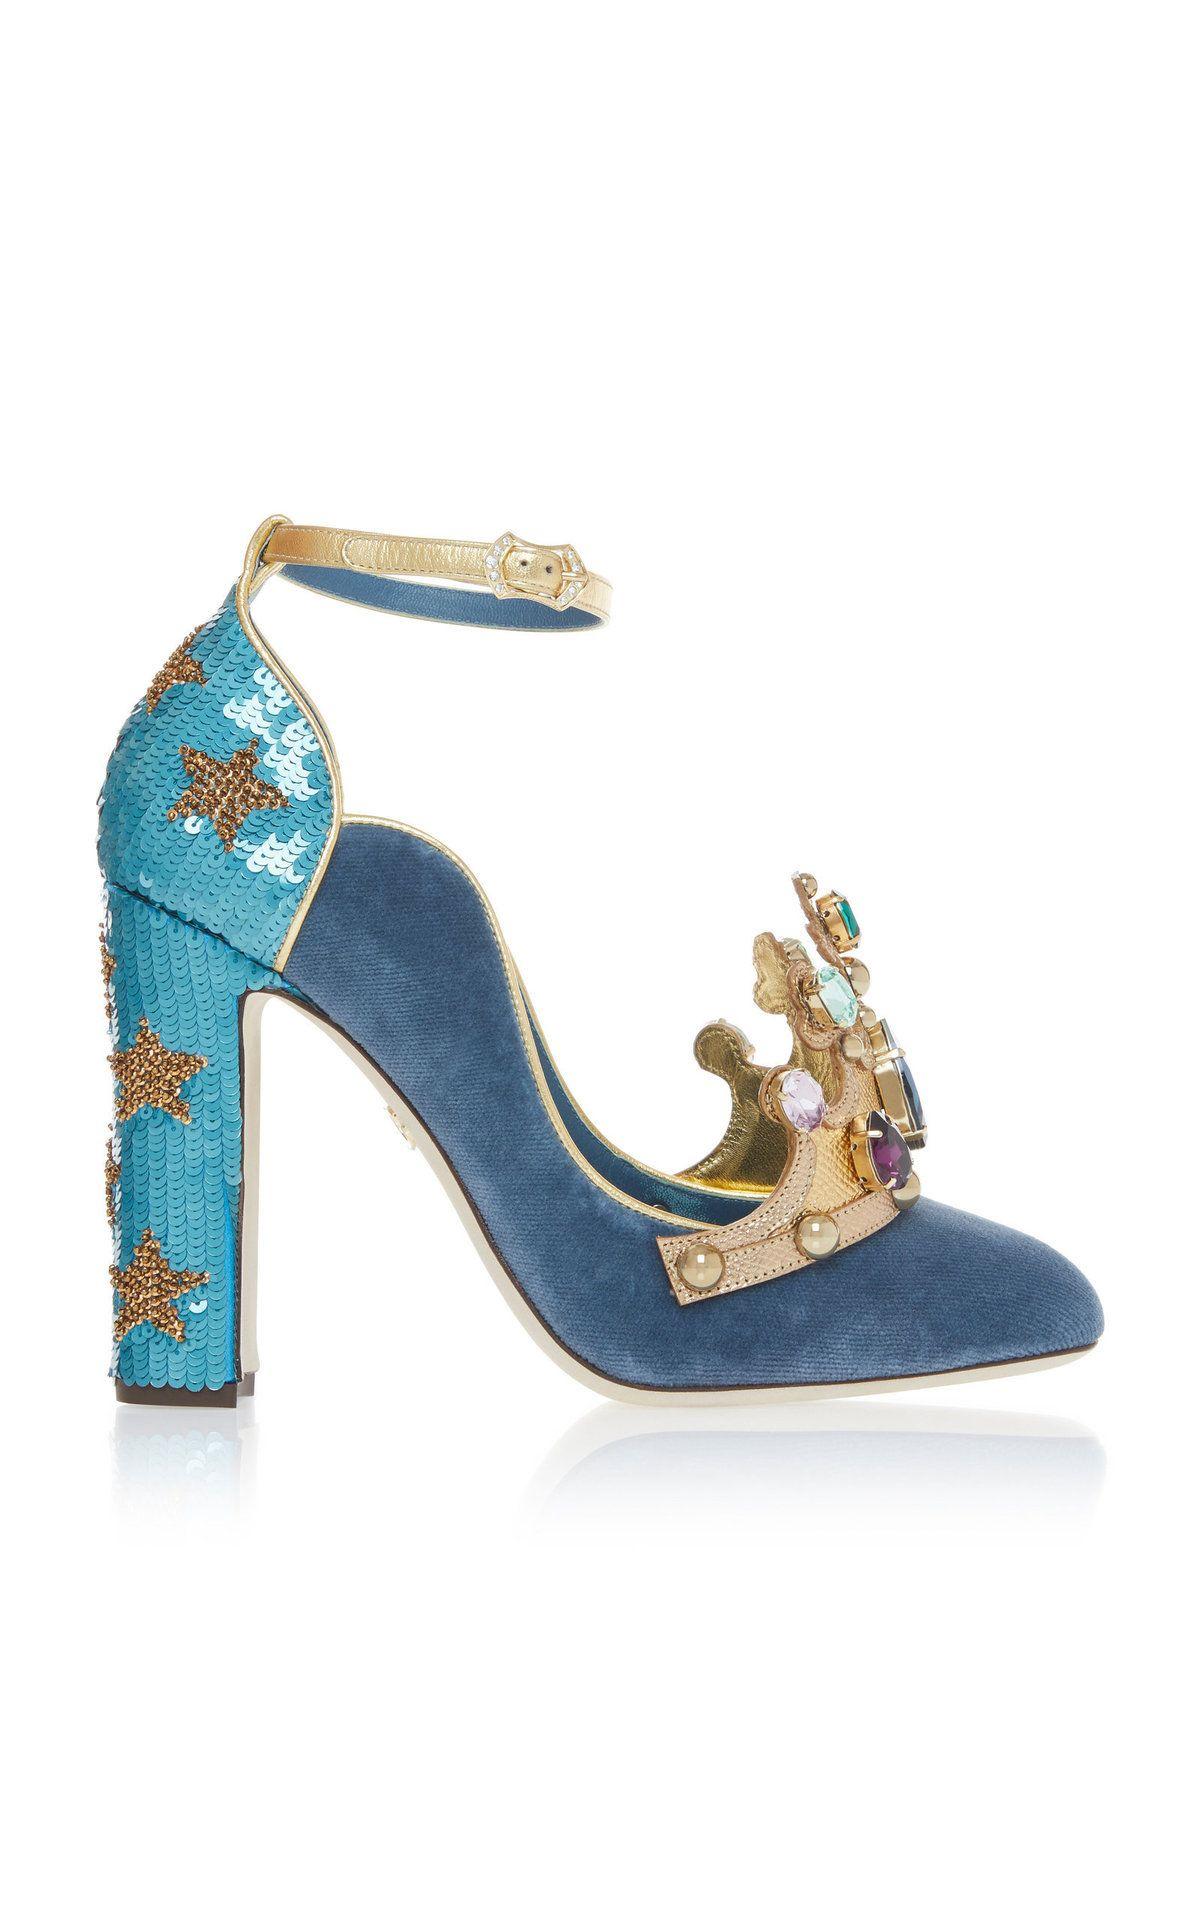 Dolce \u0026 Gabbana Crown Pumps   Dolce and